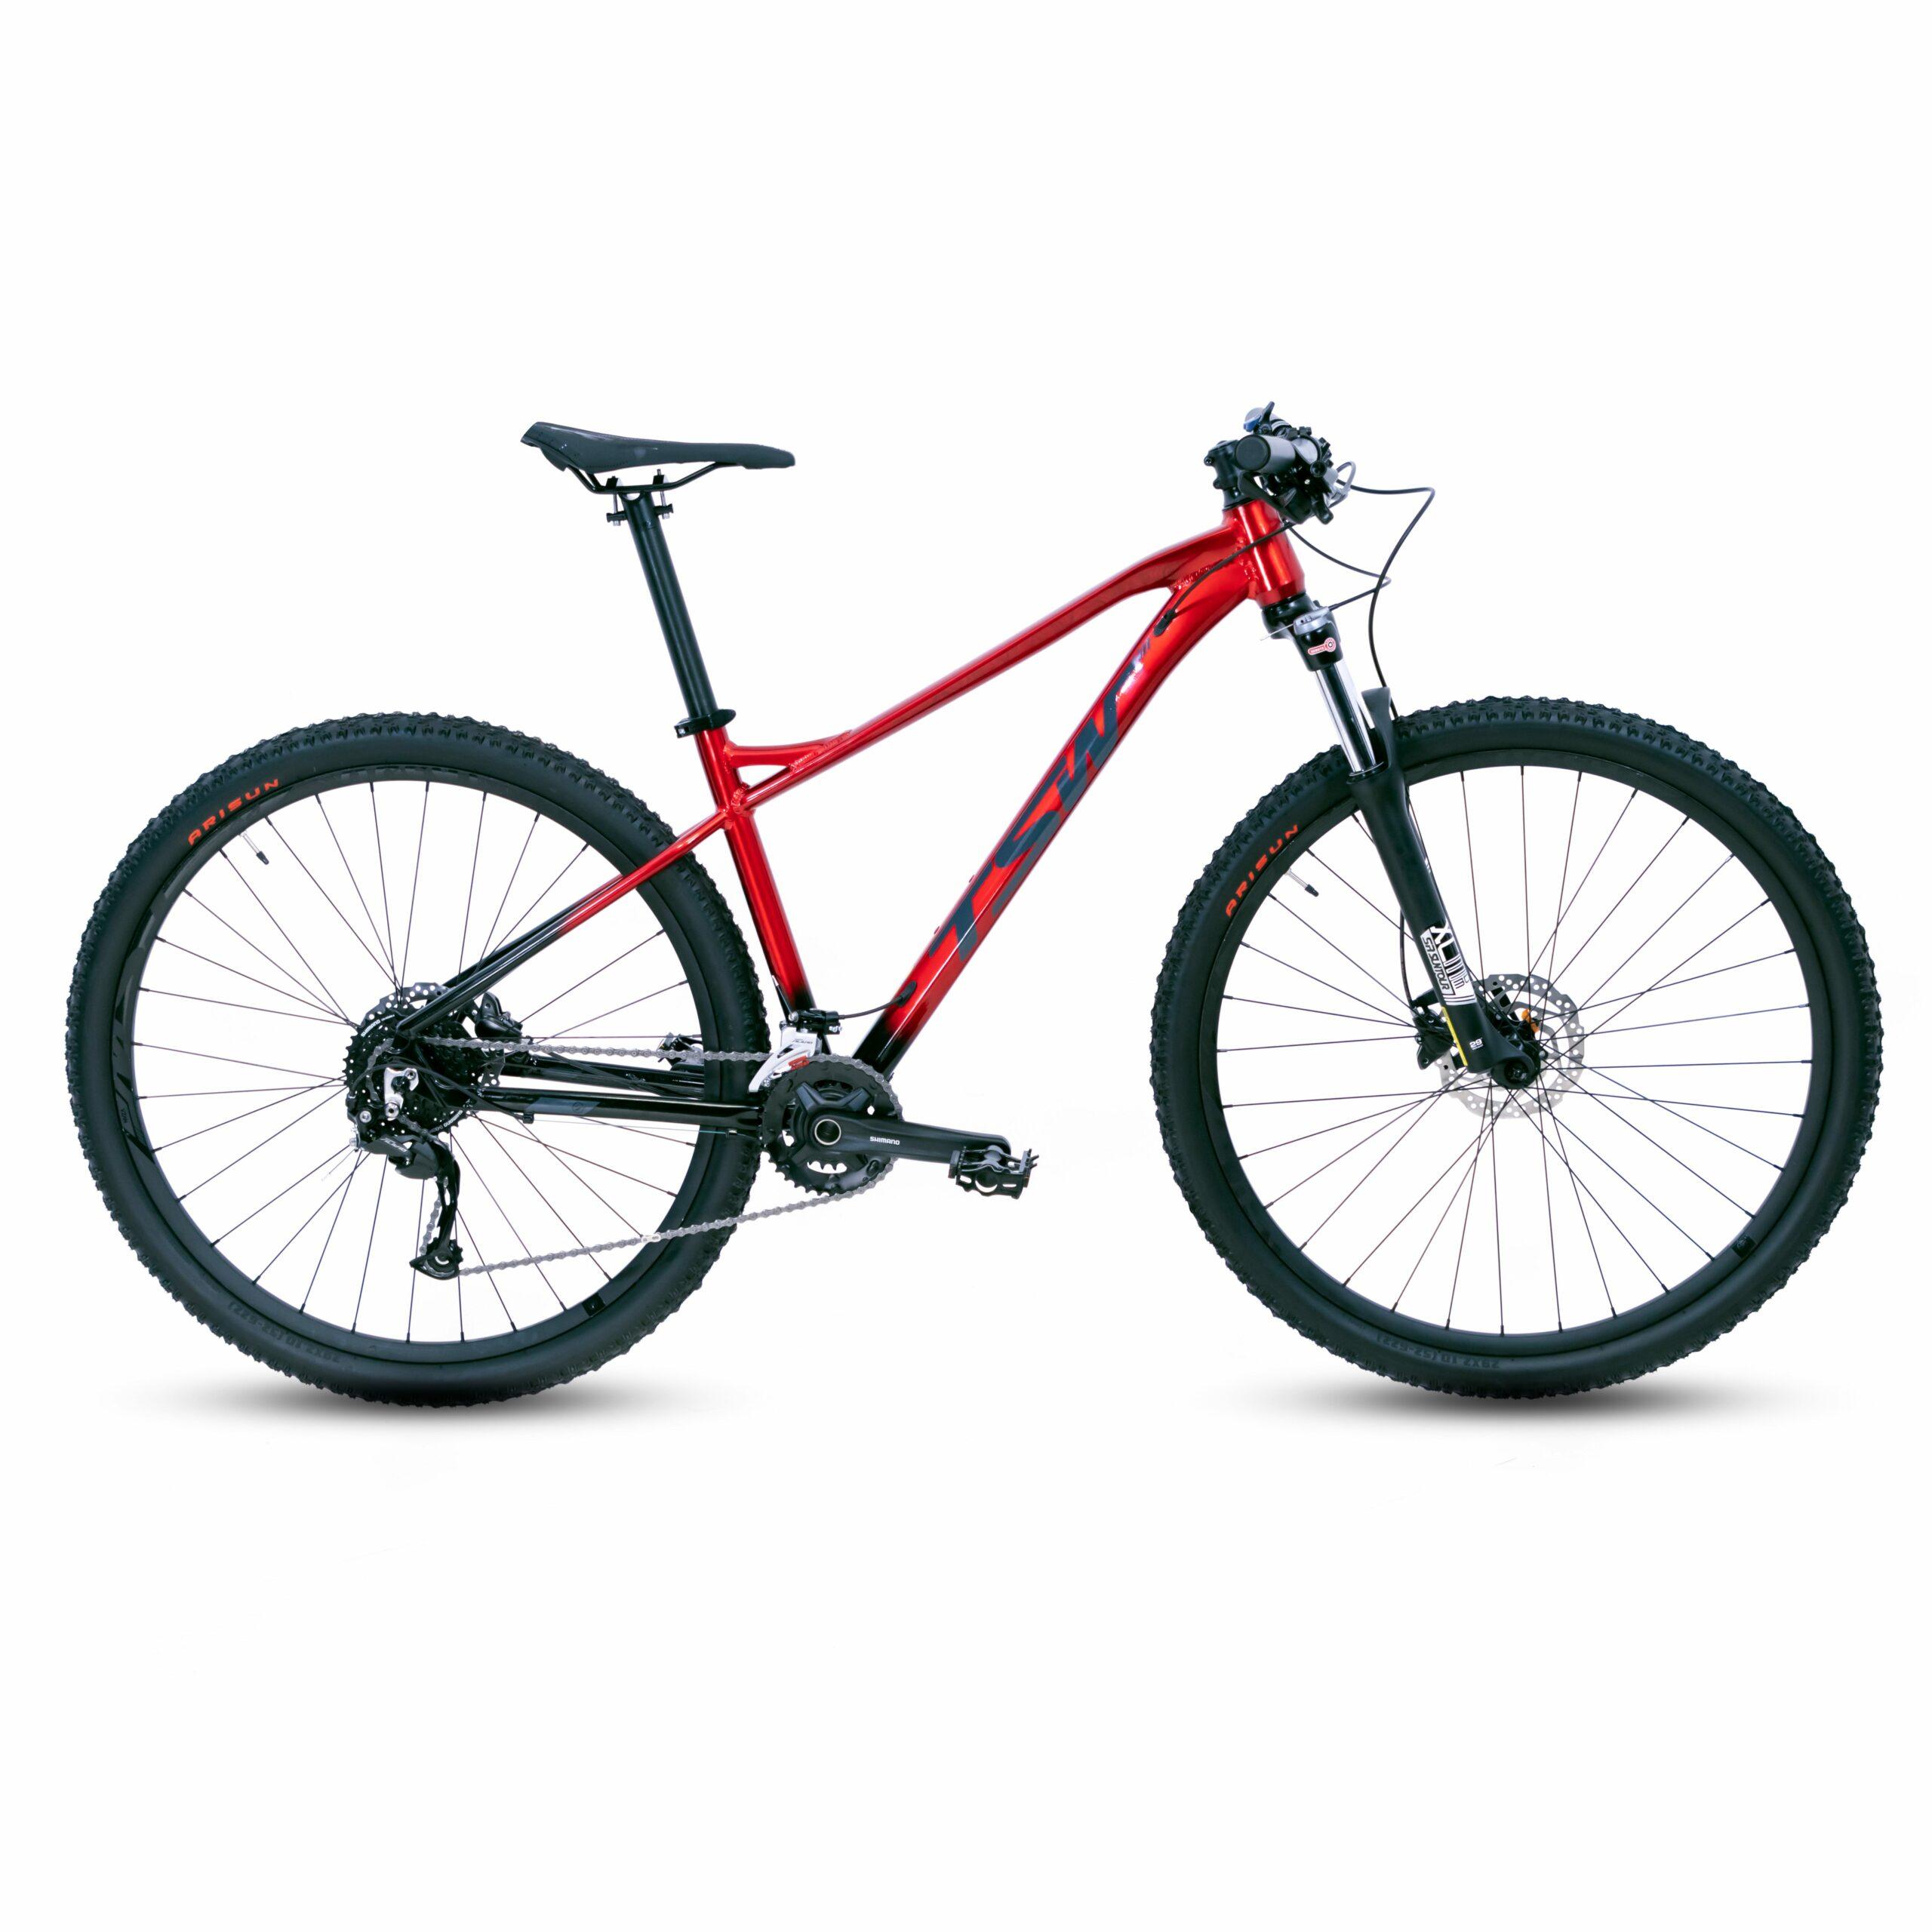 Bicicleta TSW Stamina | 2021/2022 5